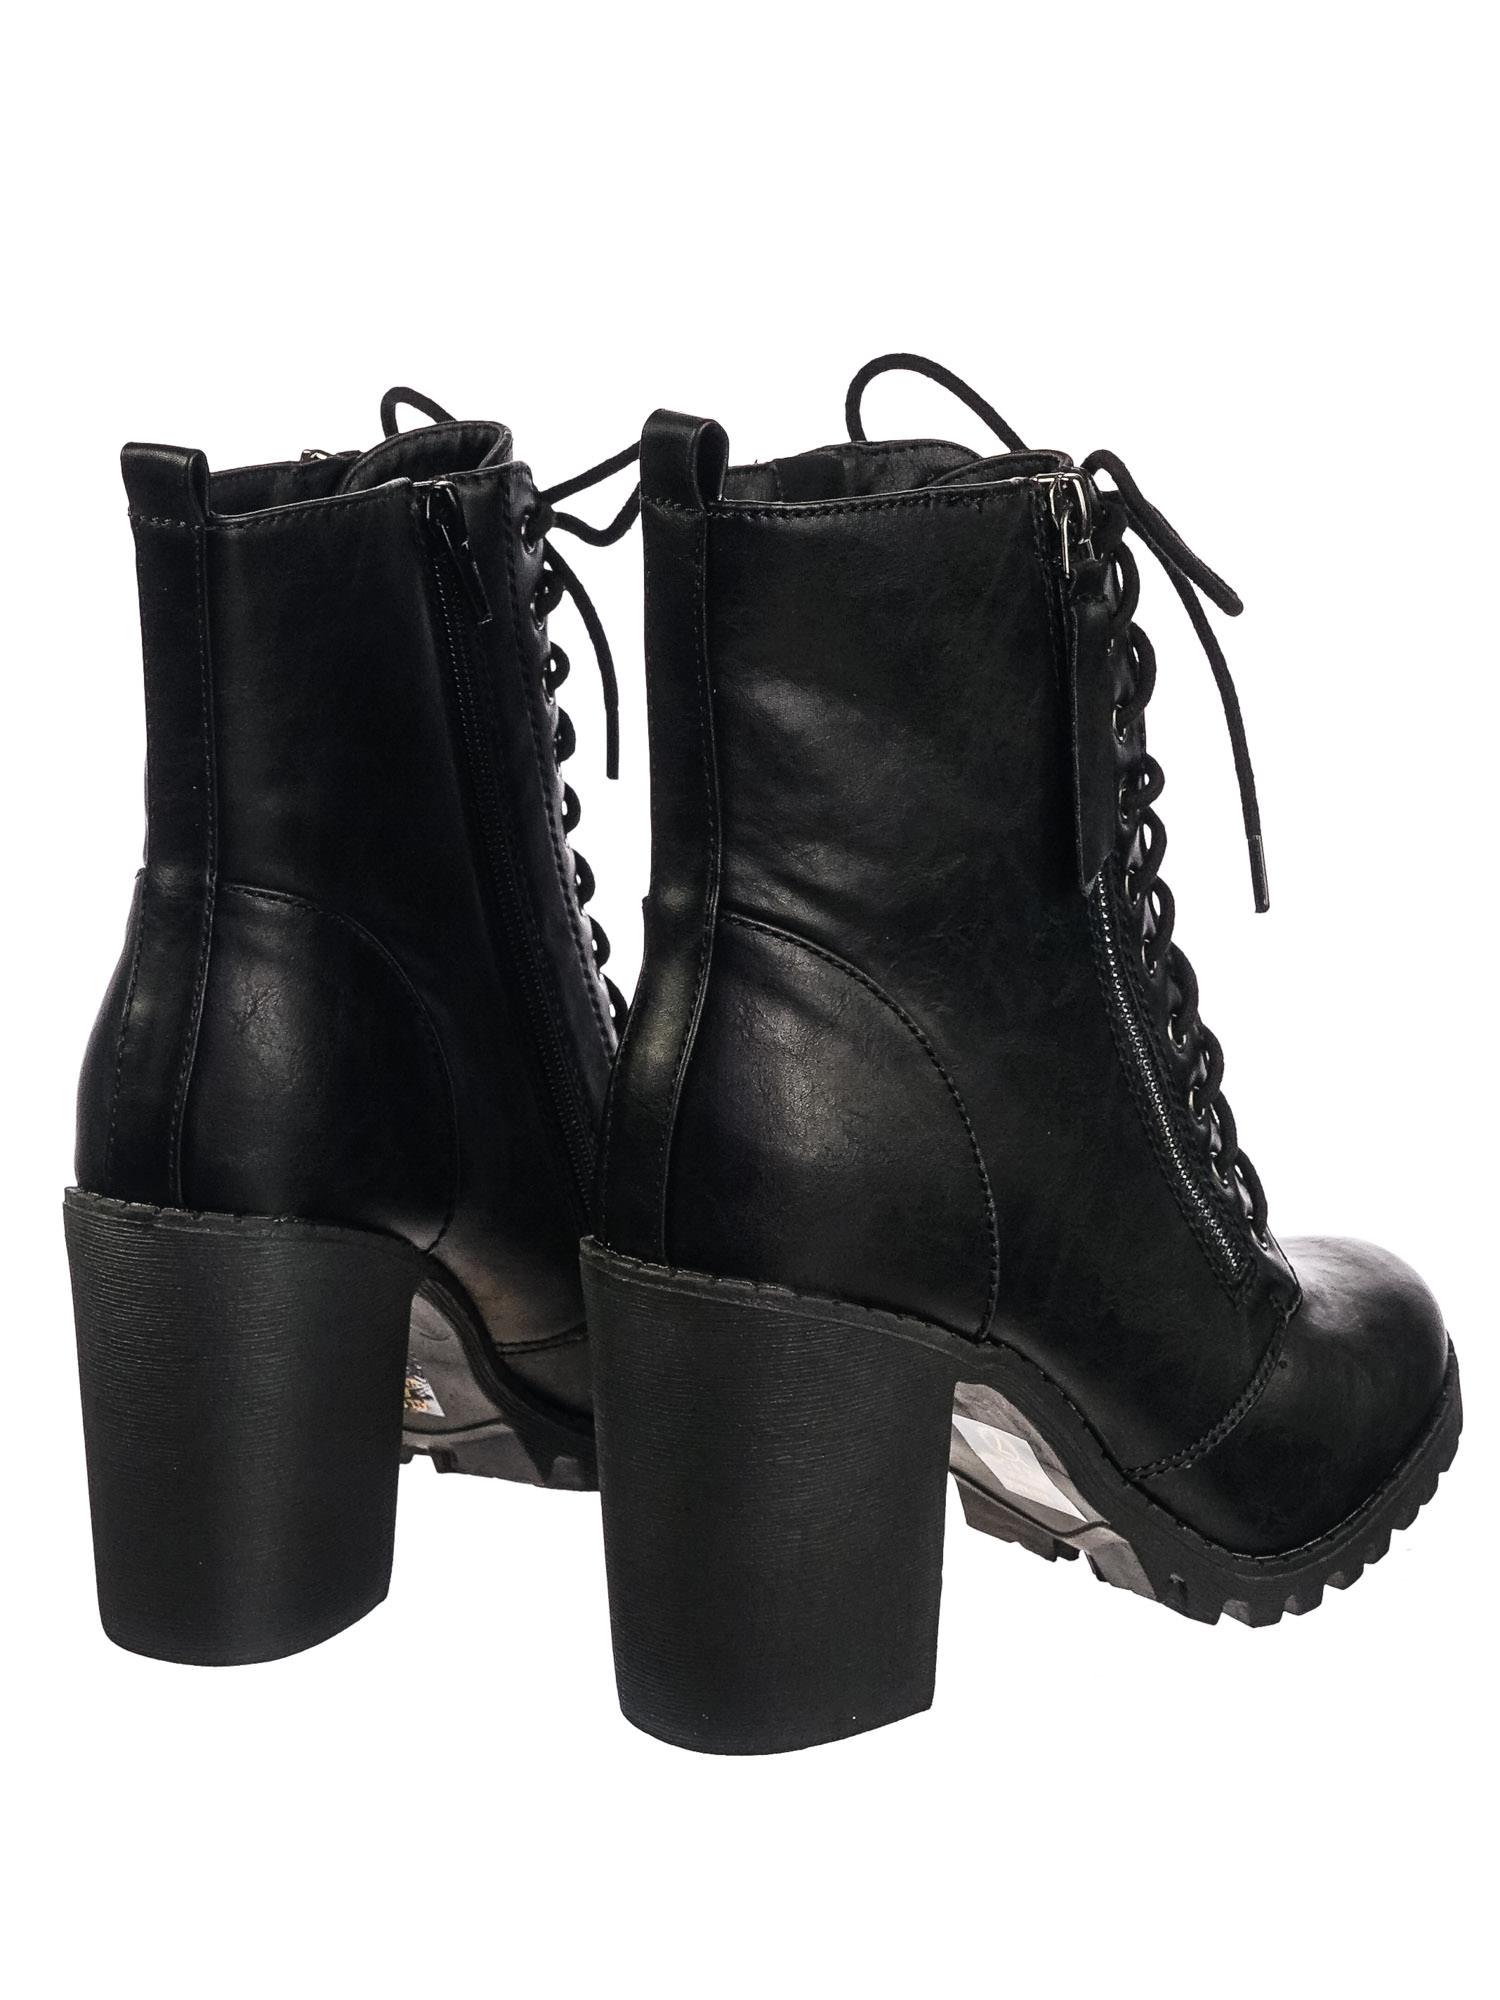 4e8c4e67977 Malia Black Pu by Soda Military Lace Up Combat Ankle Boot On Chunky Block  Heel Lug